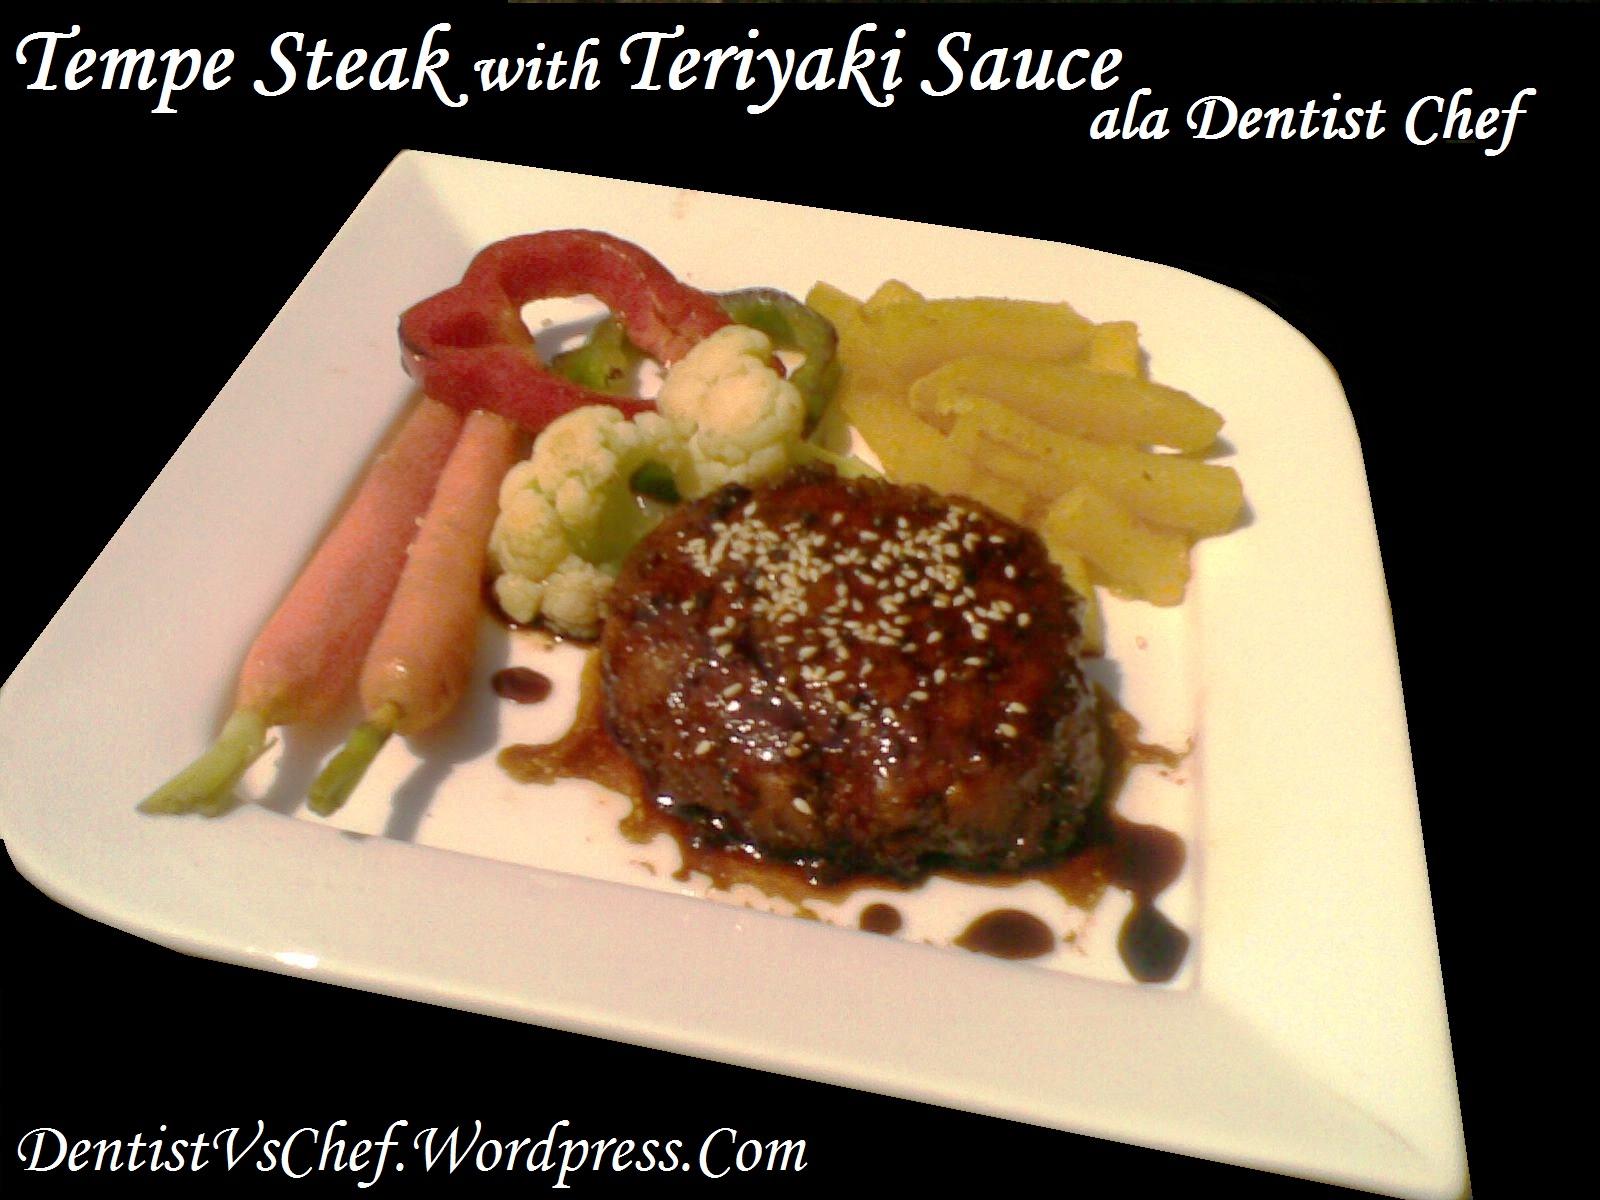 tempe yang istimewa adalah steak tempe steak tempe ini sebenarnya